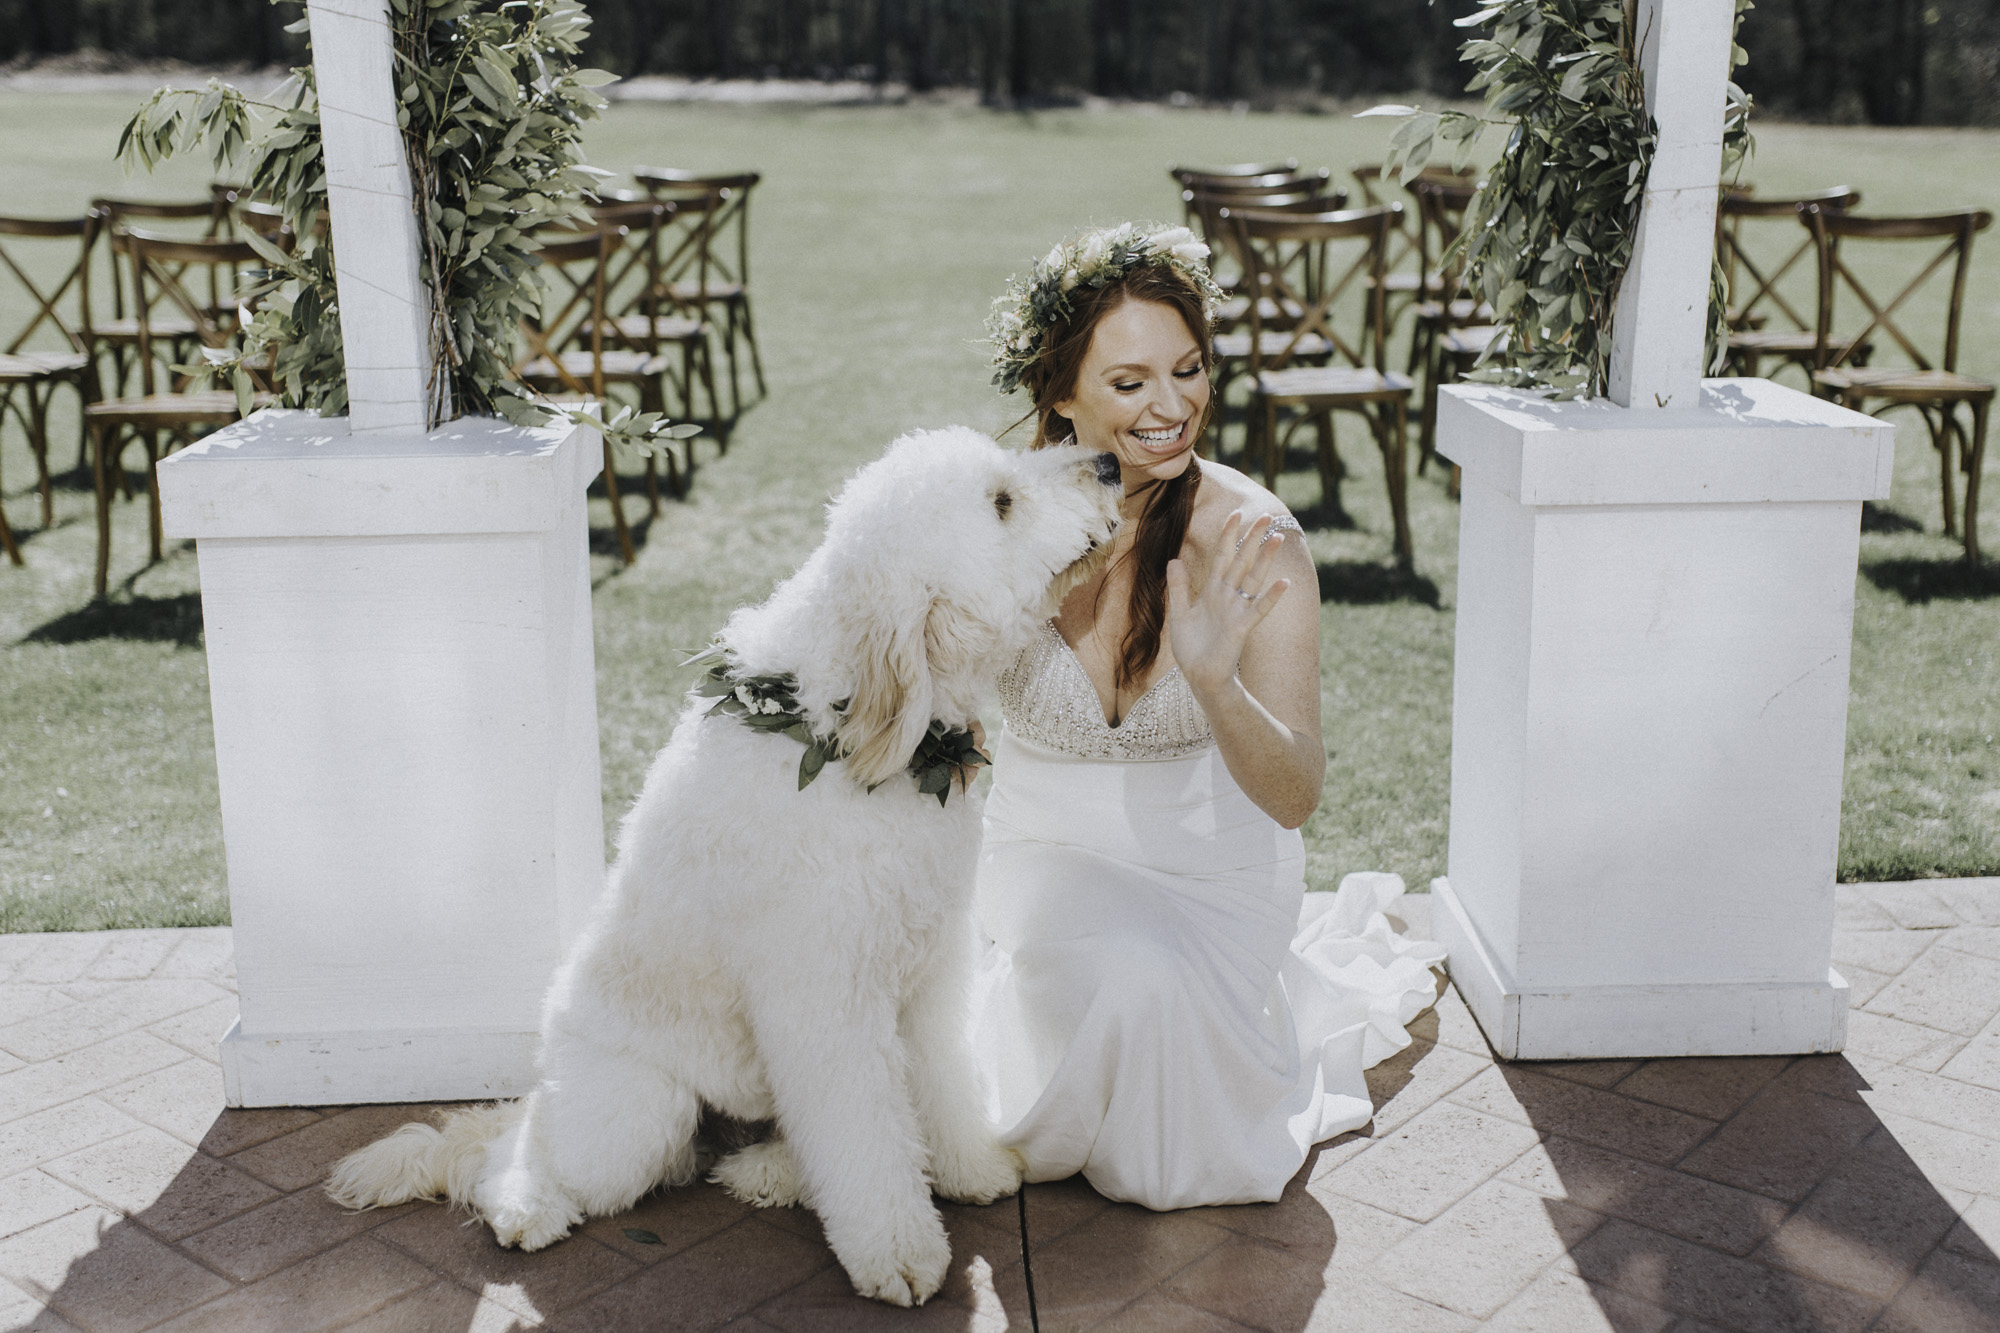 Cate_Ann_Photography_Dayton_Ohio_Wedding_Elopement_And_Engagement_PhotographerIMG_8835.jpg